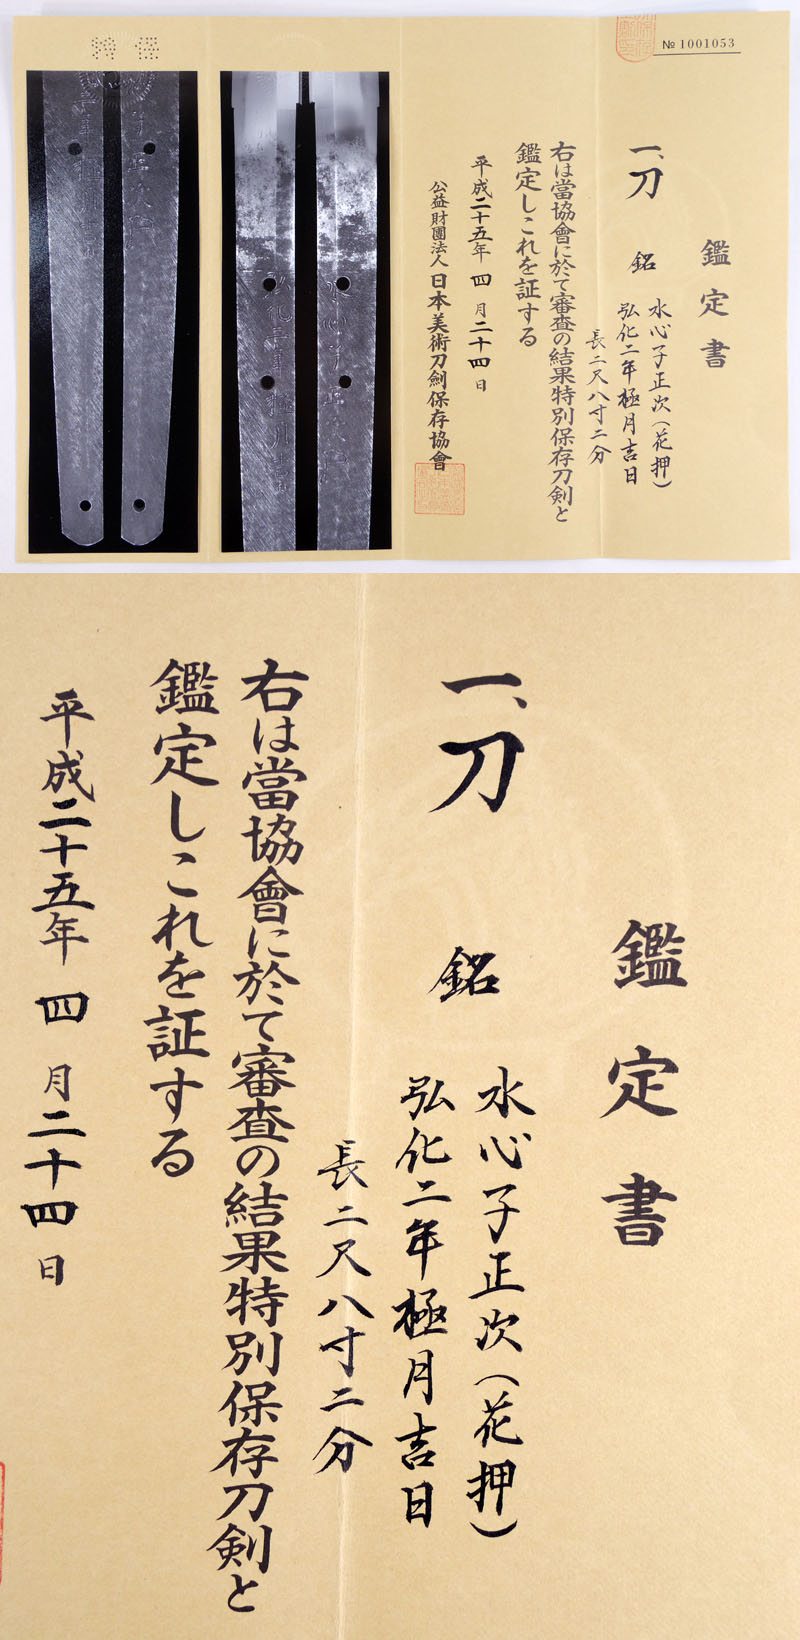 水心子正次 Picture of Certificate